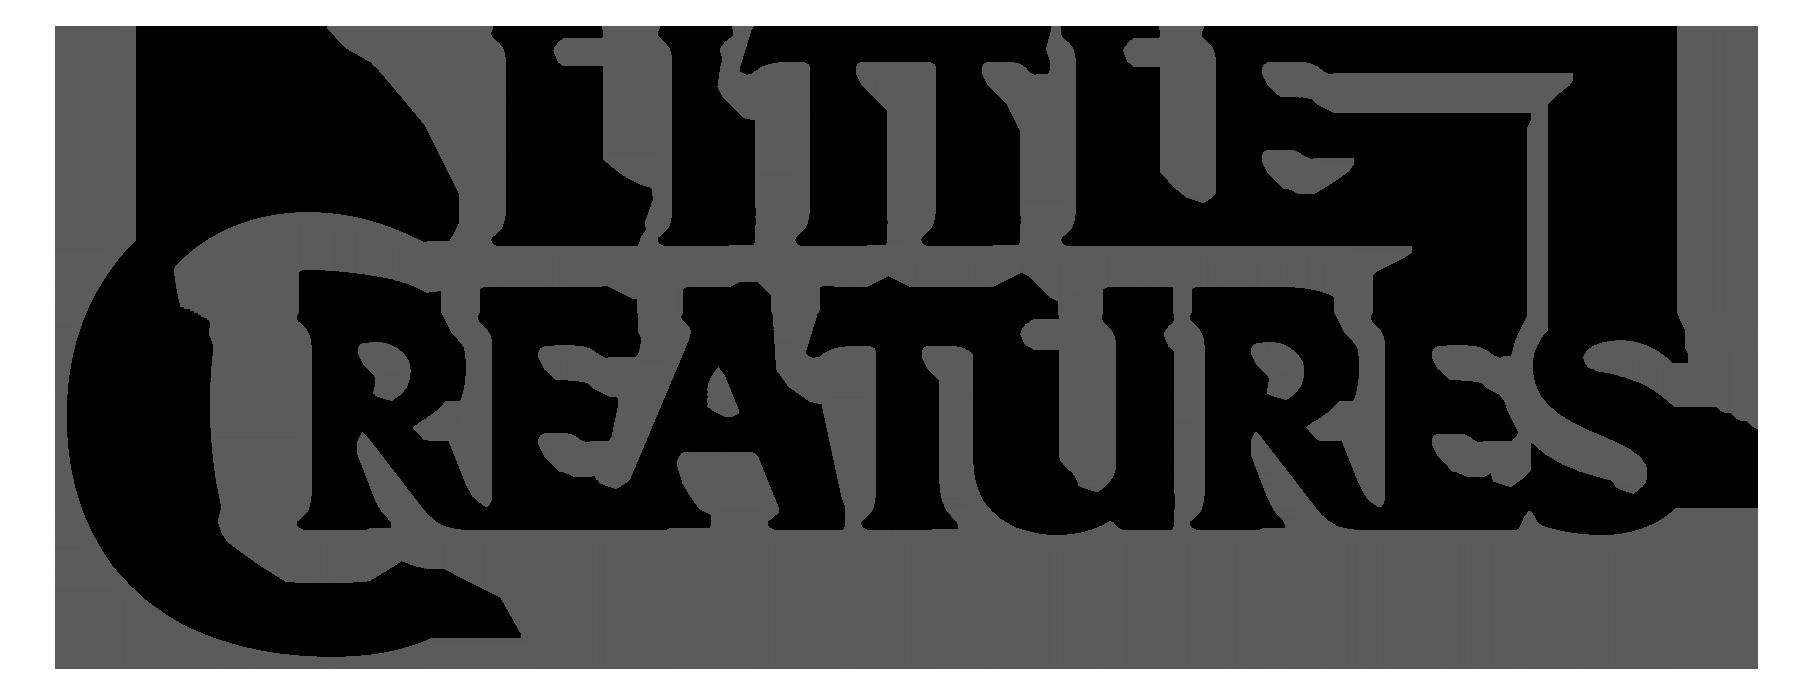 003_little_creatures